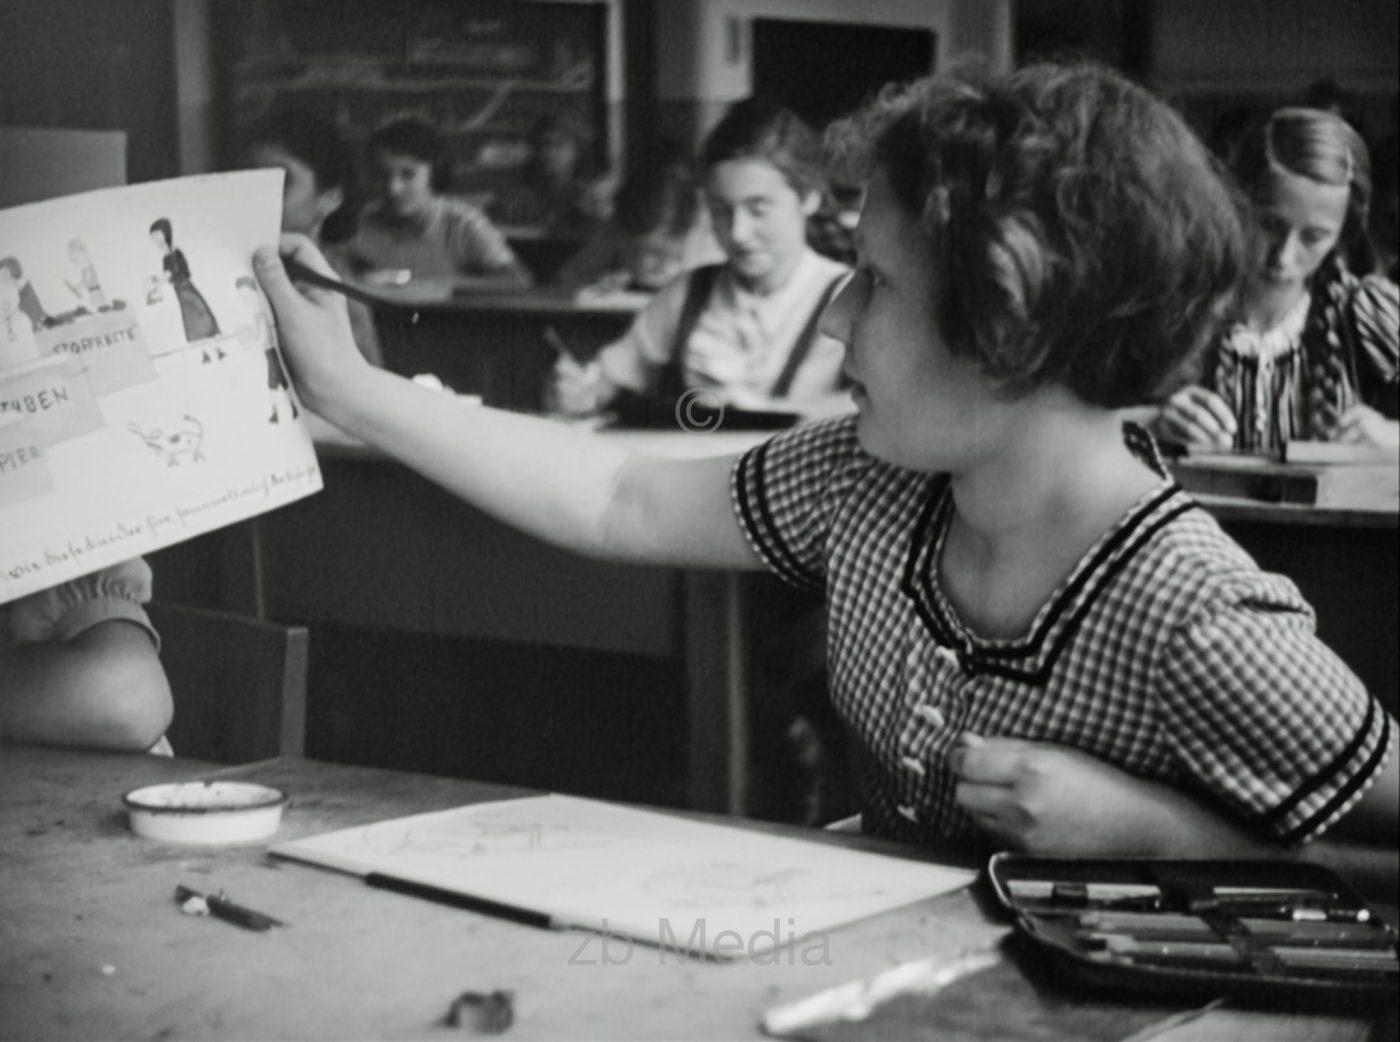 Deutschland 1937. Zinnowaldschule in Berlin.